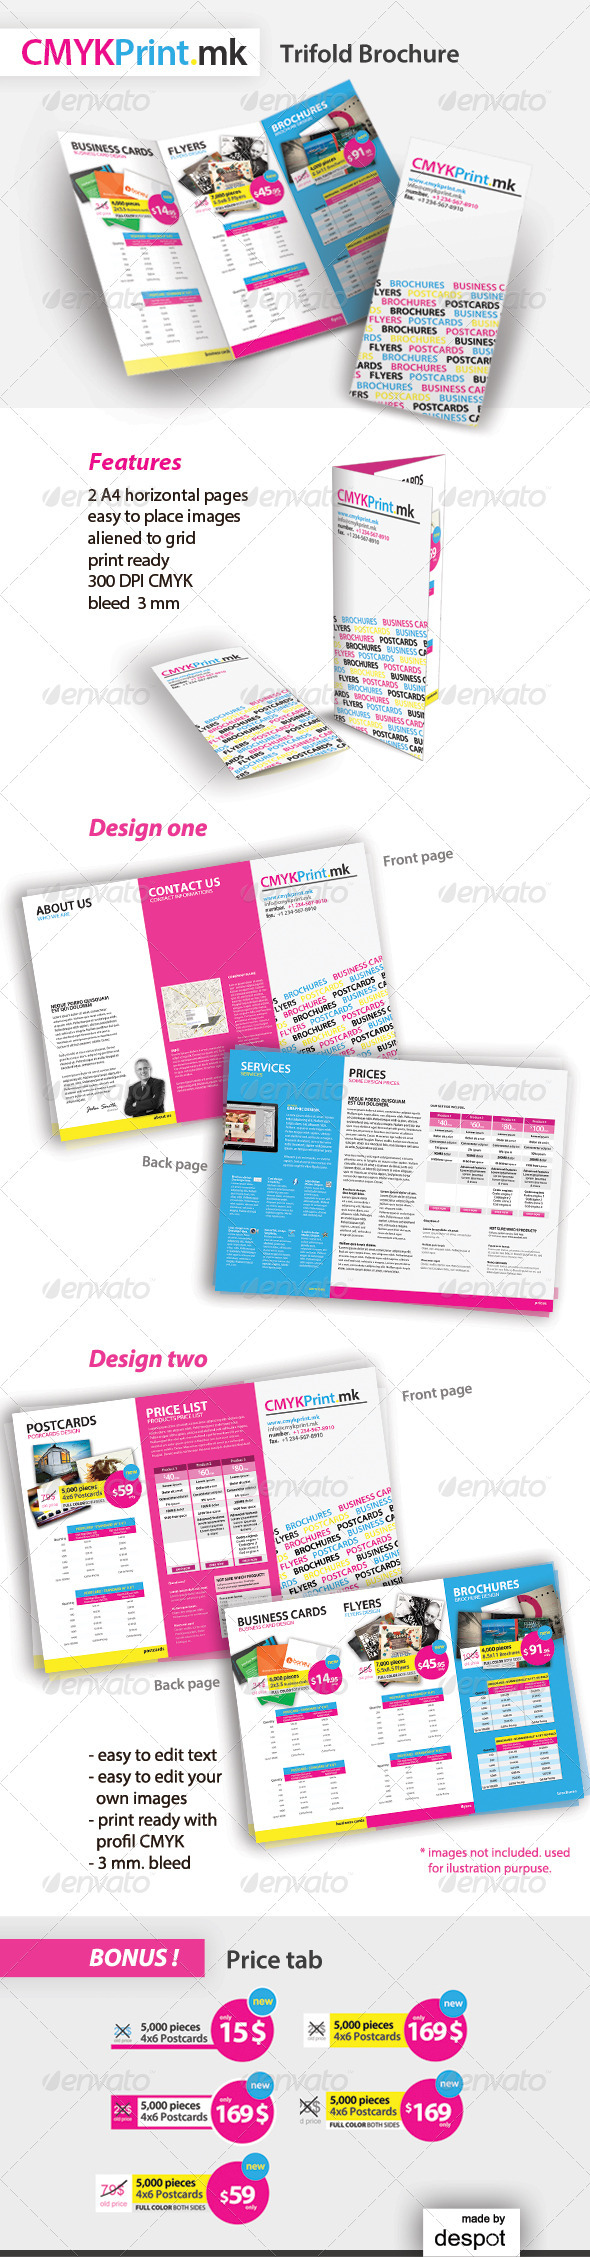 CMYK Print Trifold Brochure - Brochures Print Templates